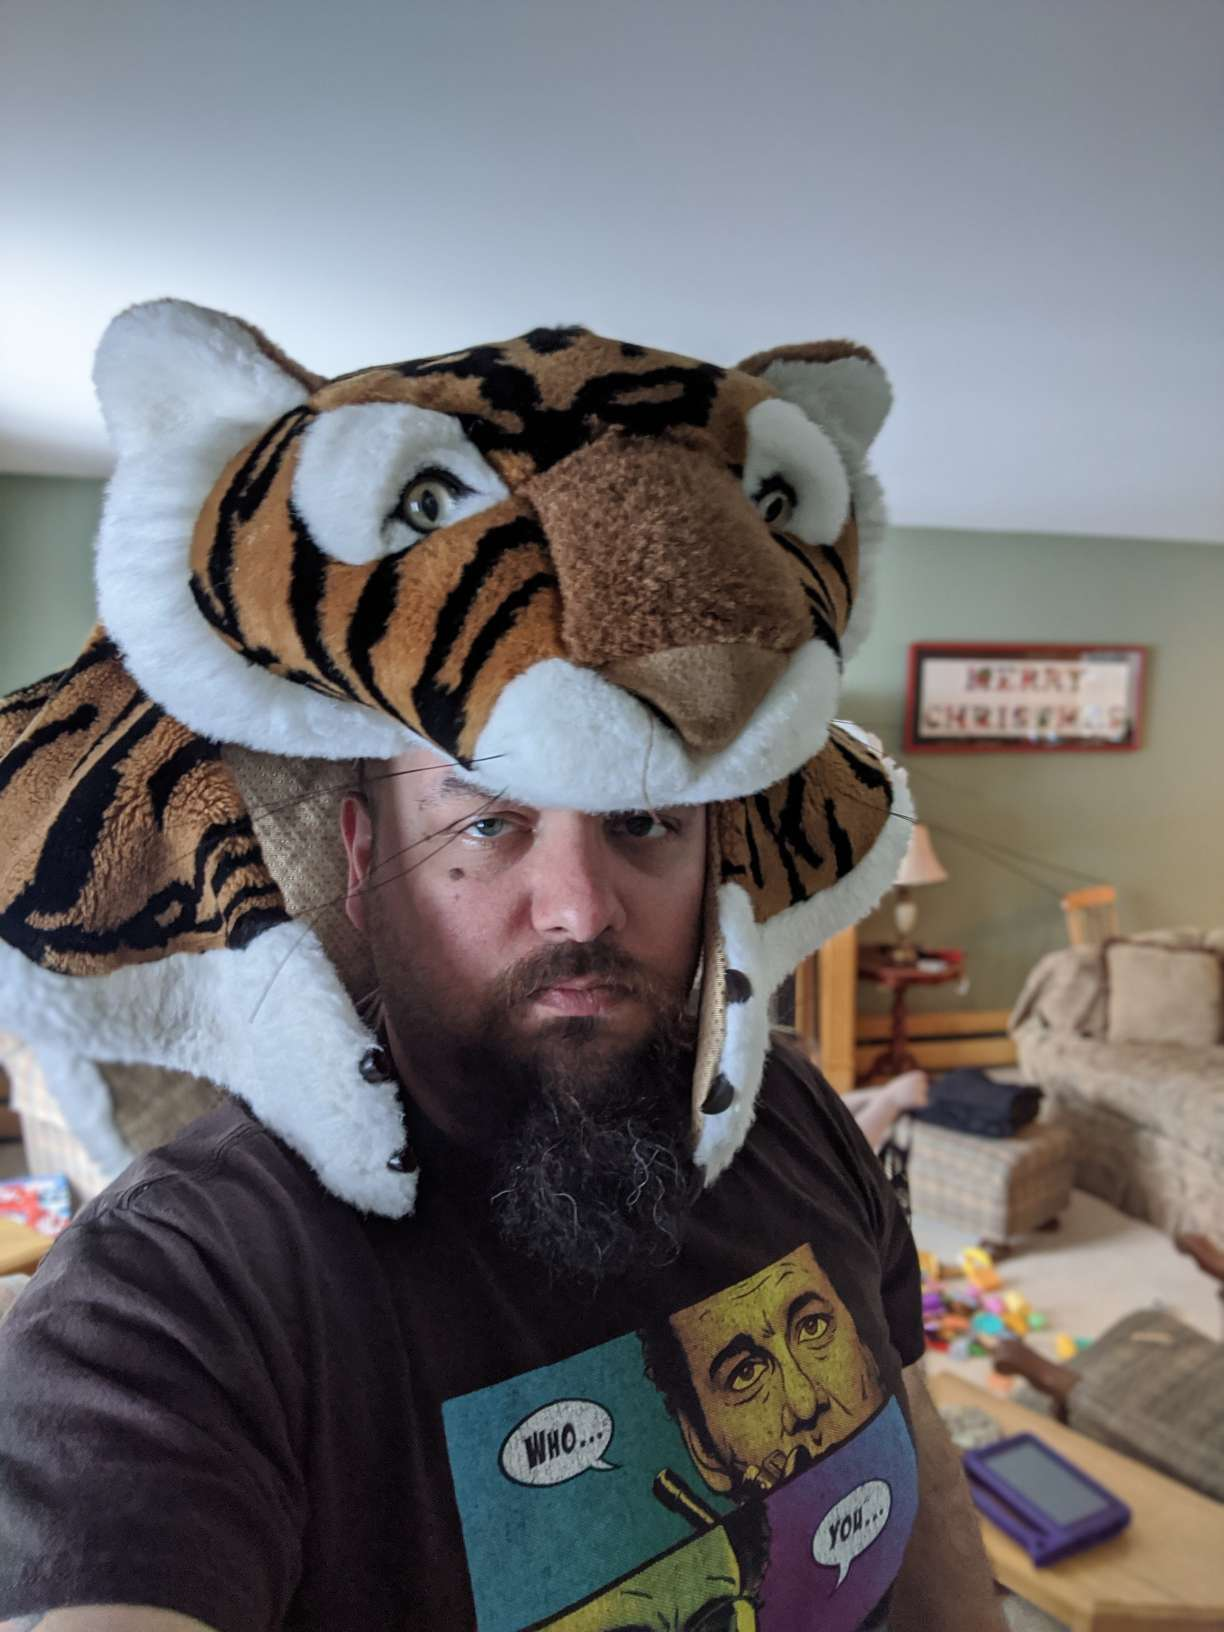 John-Ross 's profile image